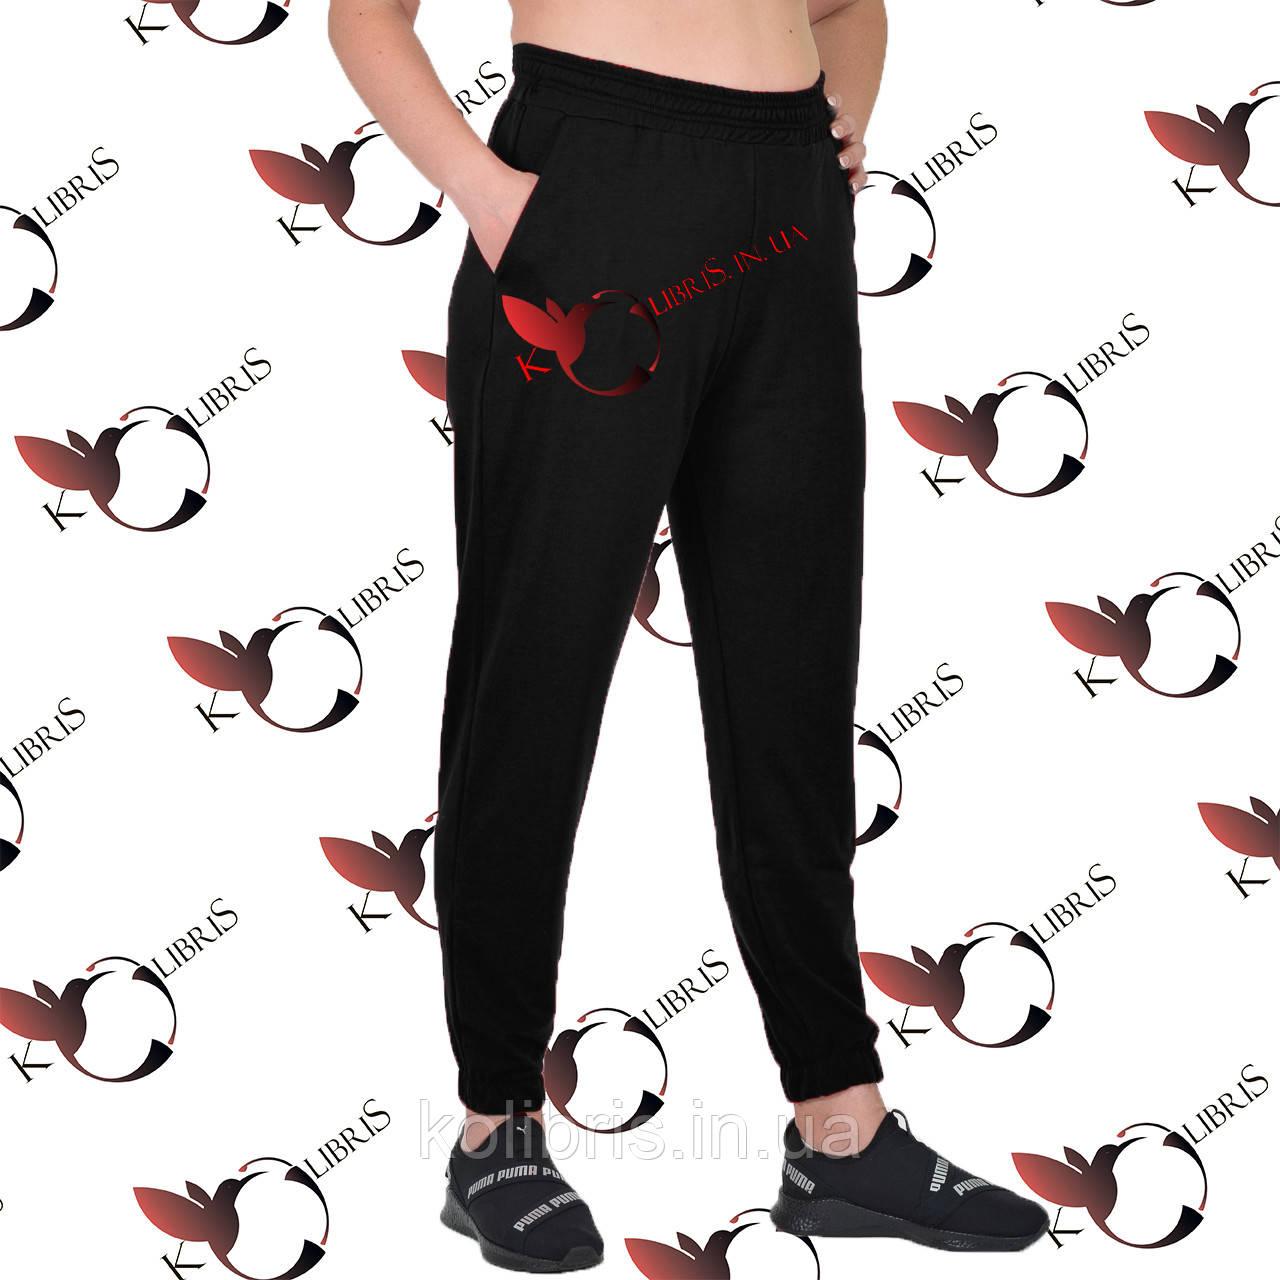 Женские брюки на резинке размеры от 50 до 58 трехнитка на флисе черного цвета